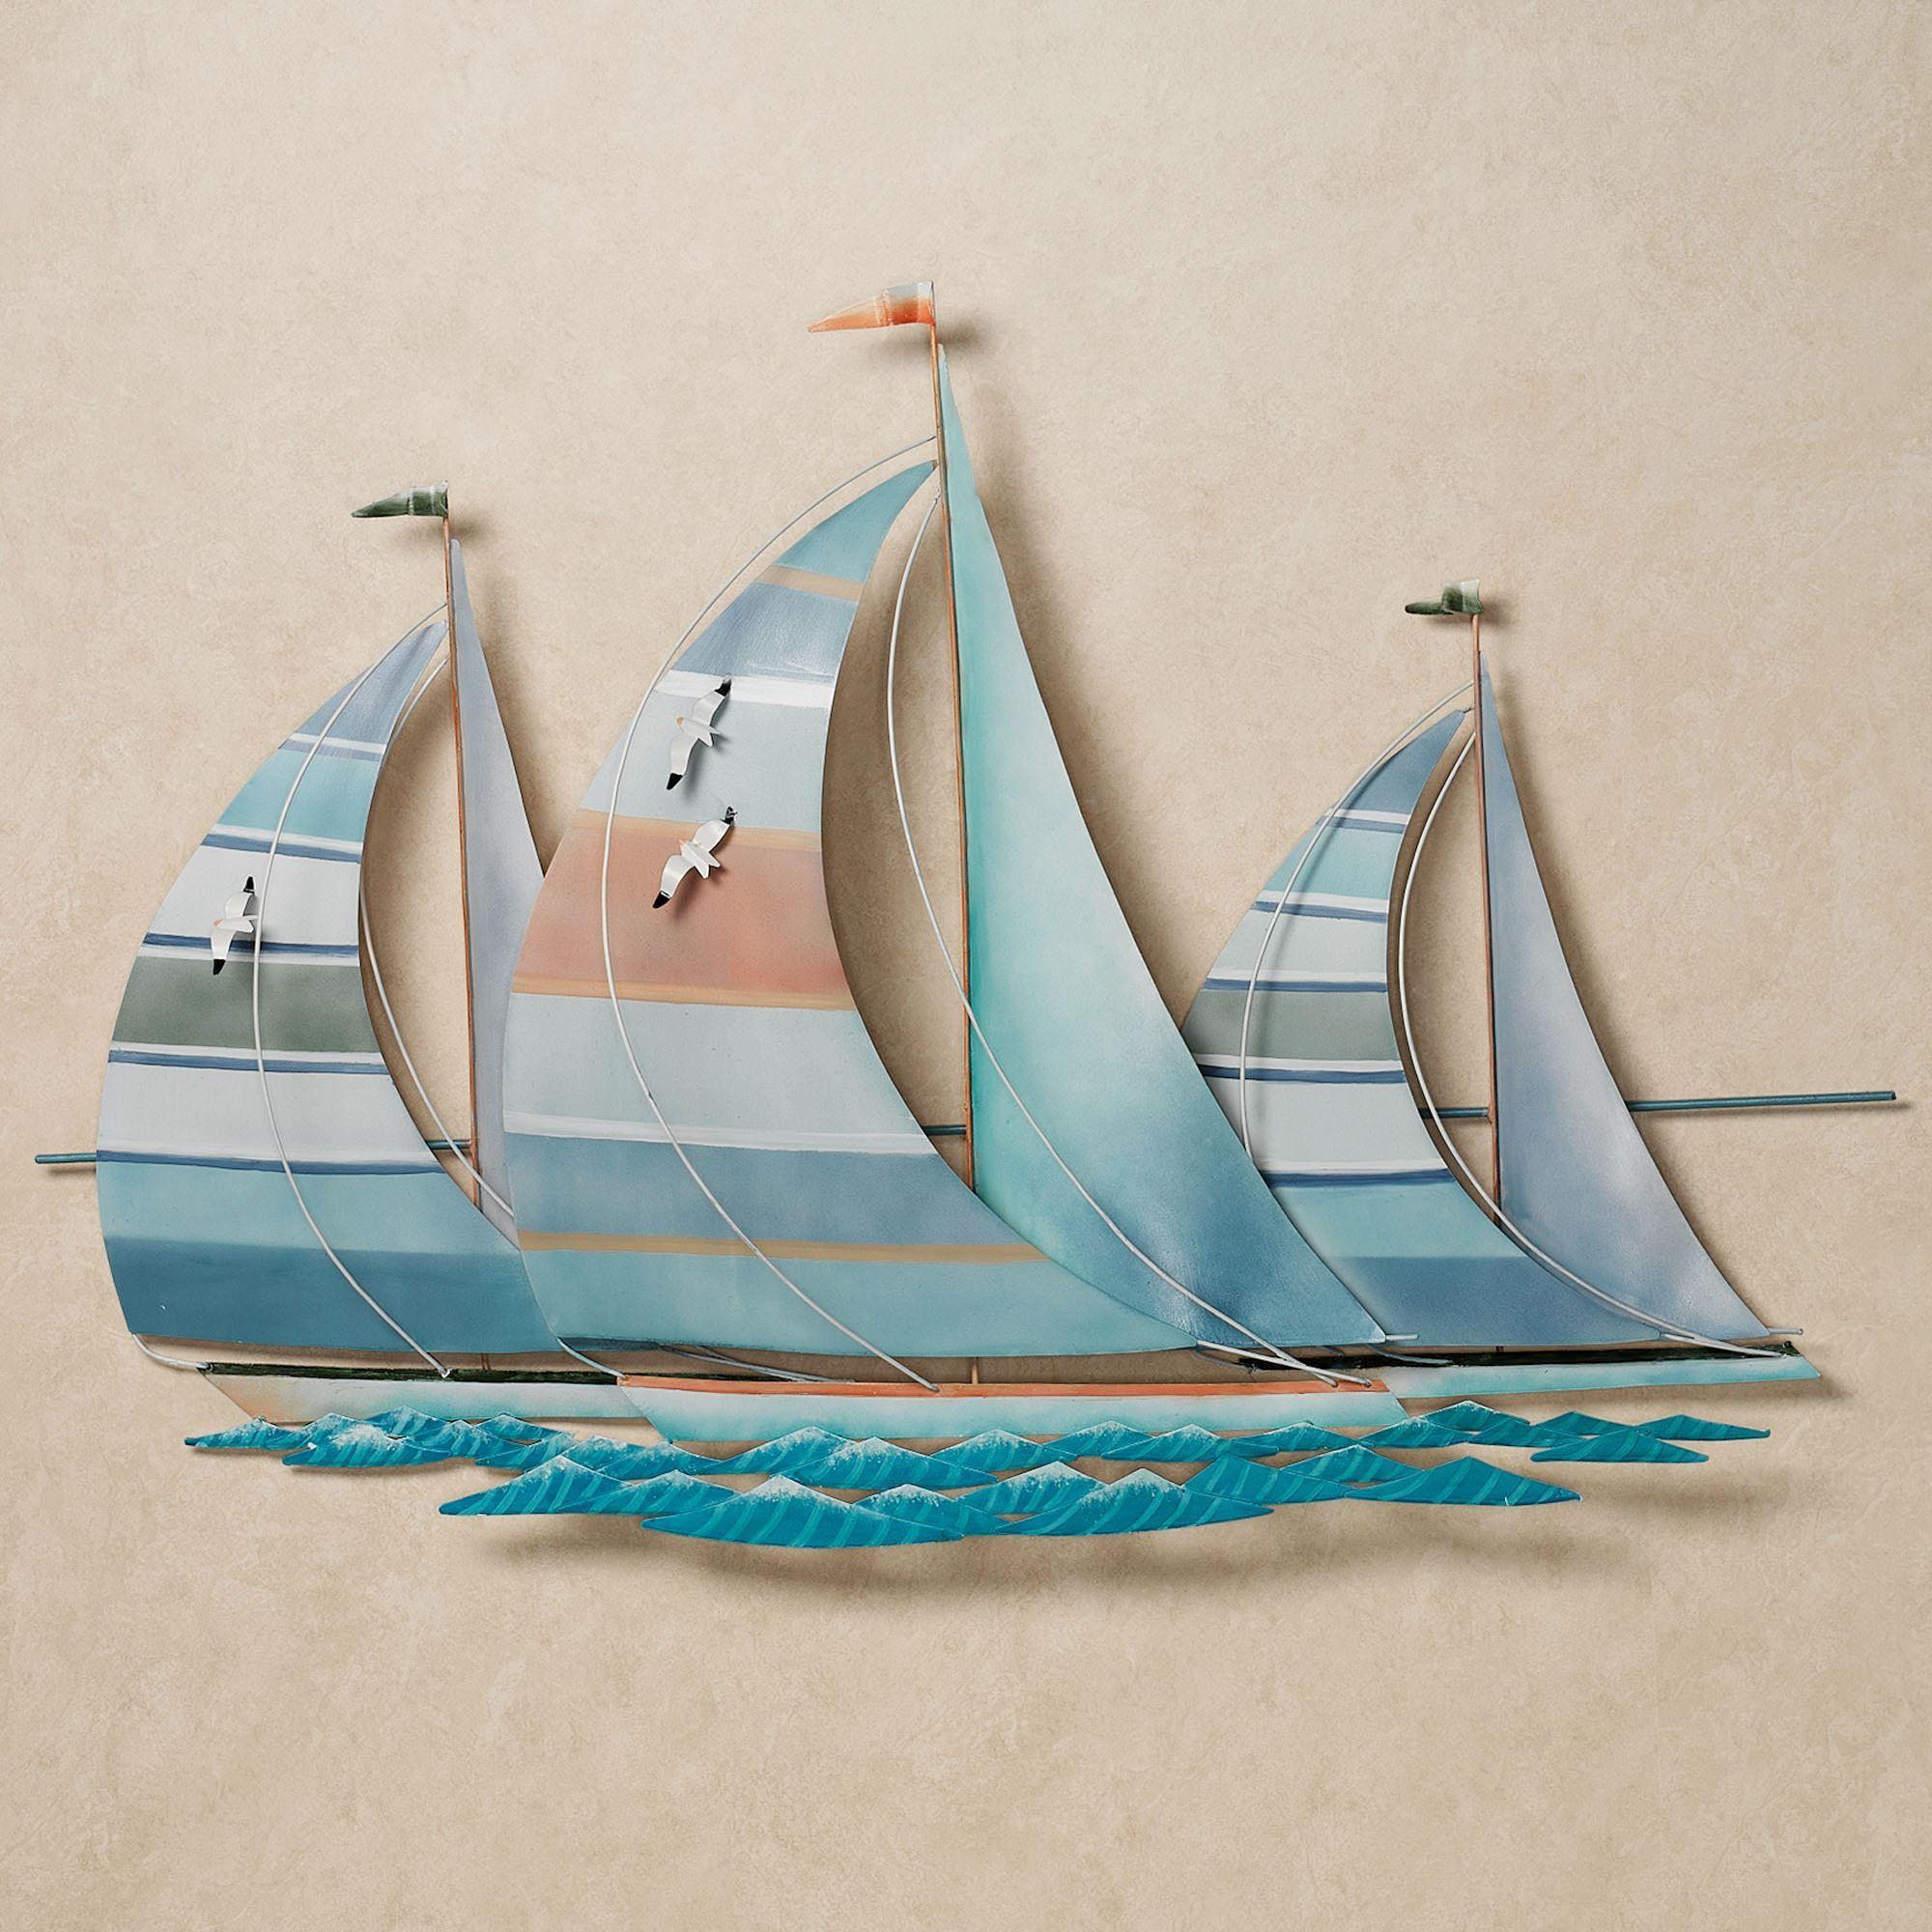 Art Décor: Regatta Finish Line Multi Cool Metal Sailboat Wall Sculpture